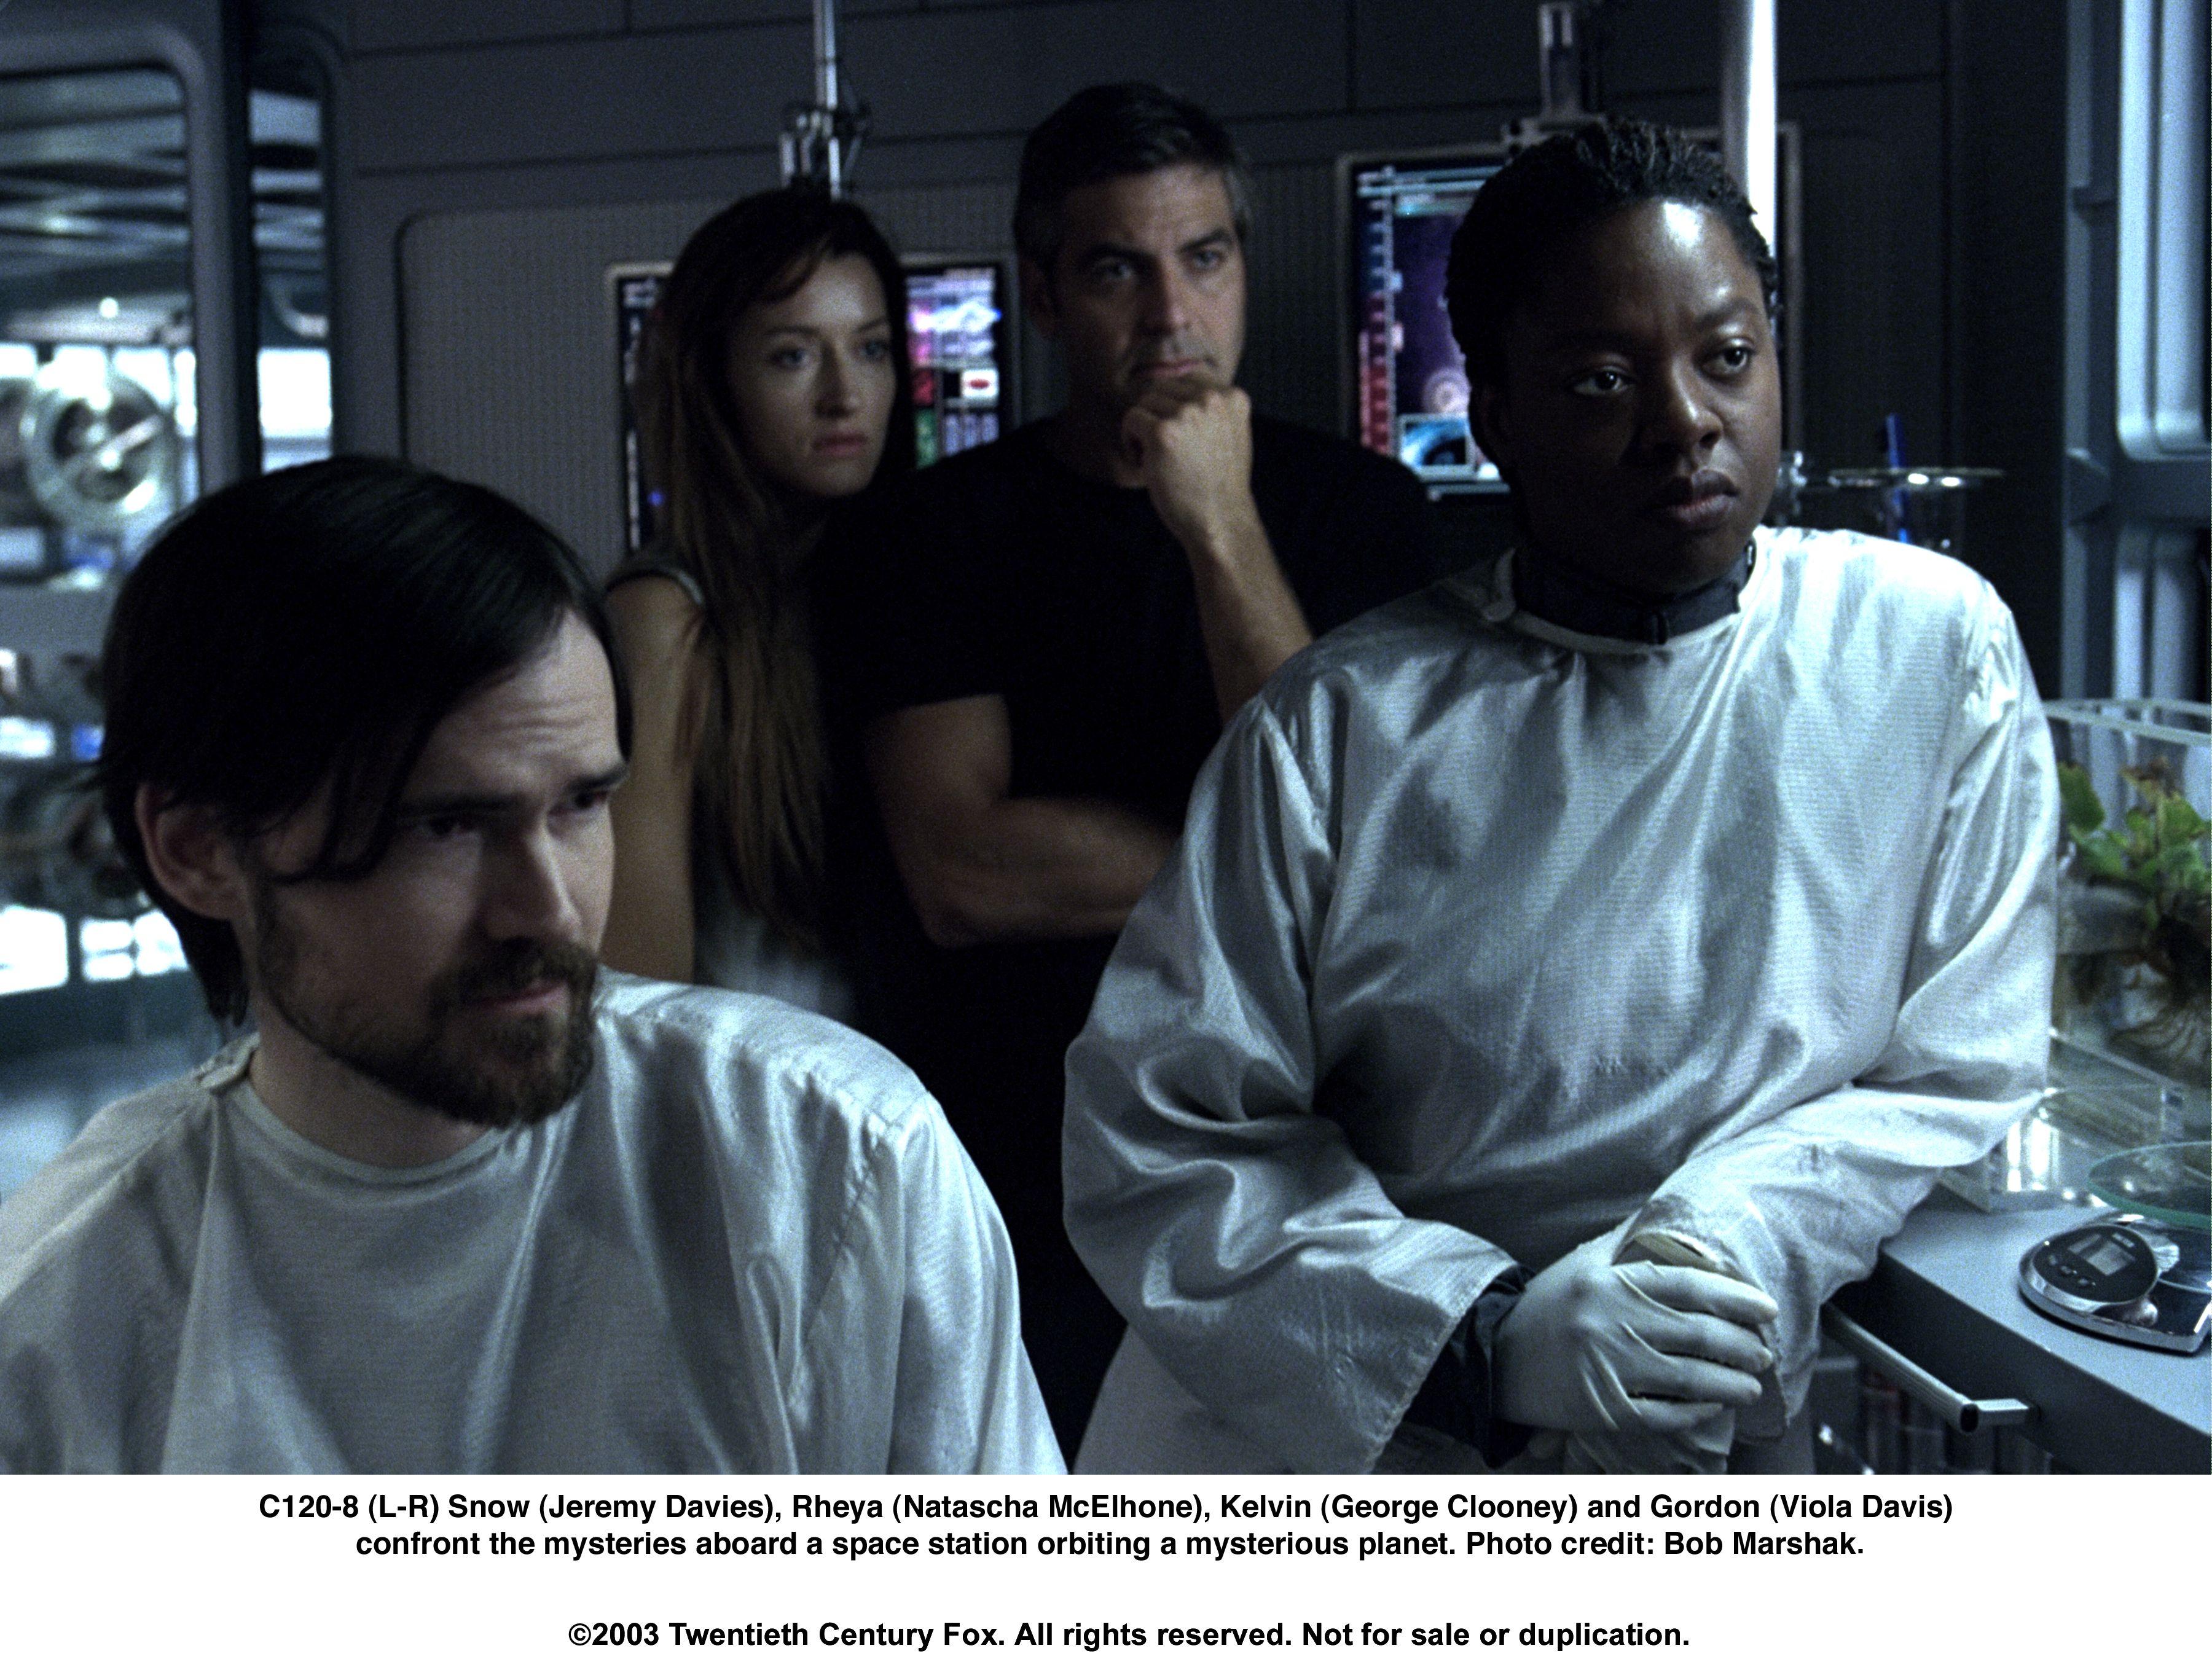 George Clooney, Jeremy Davies, Natascha McElhone, and Viola Davis in Solaris (2002)